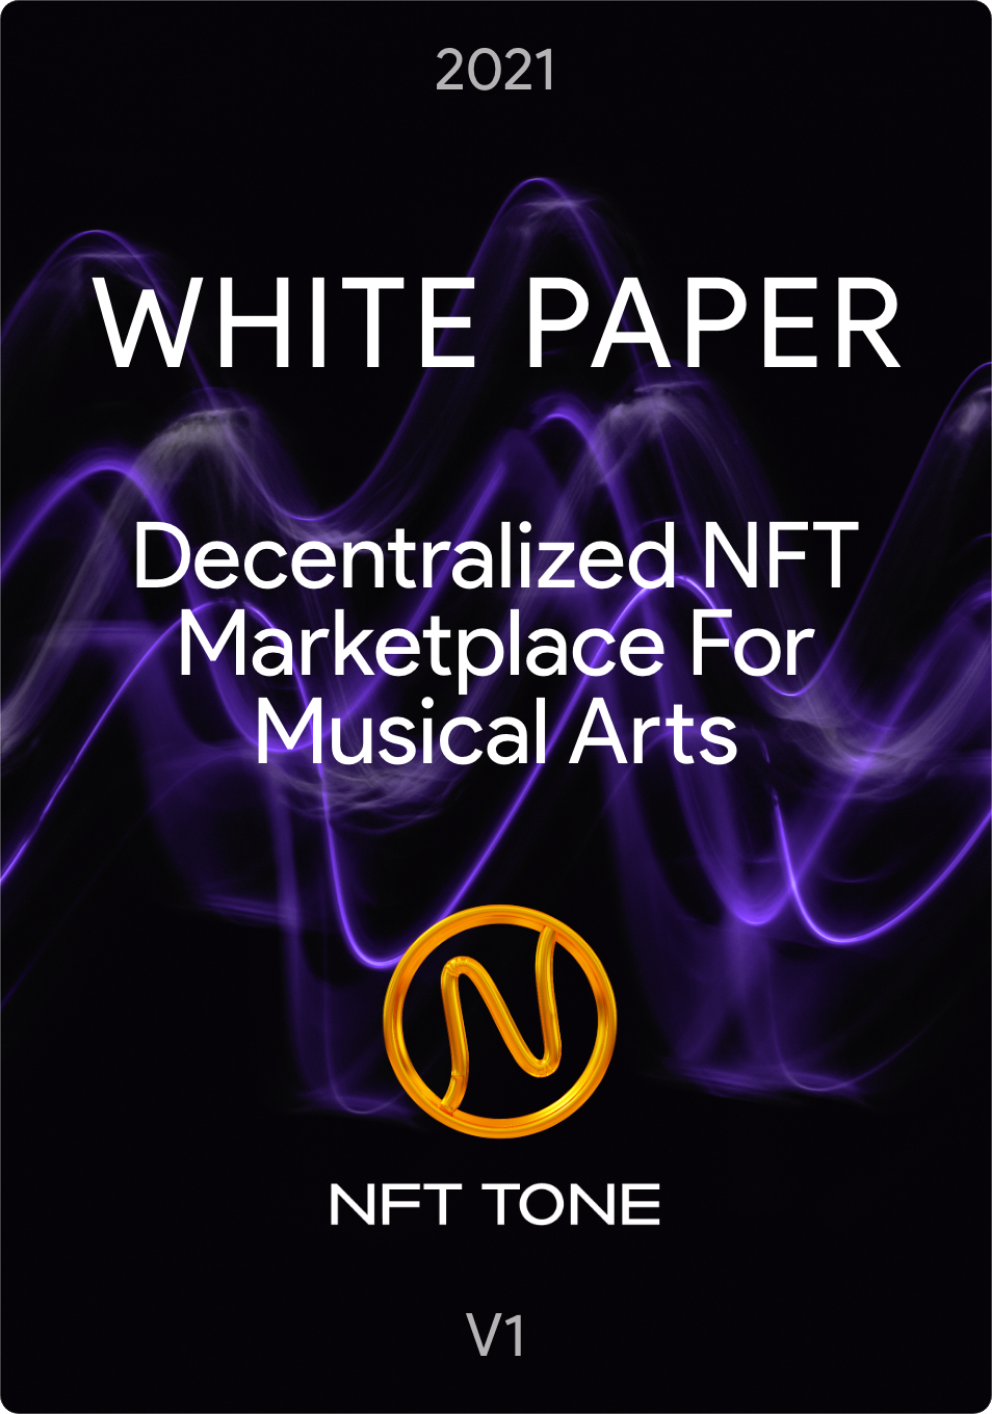 White paper image